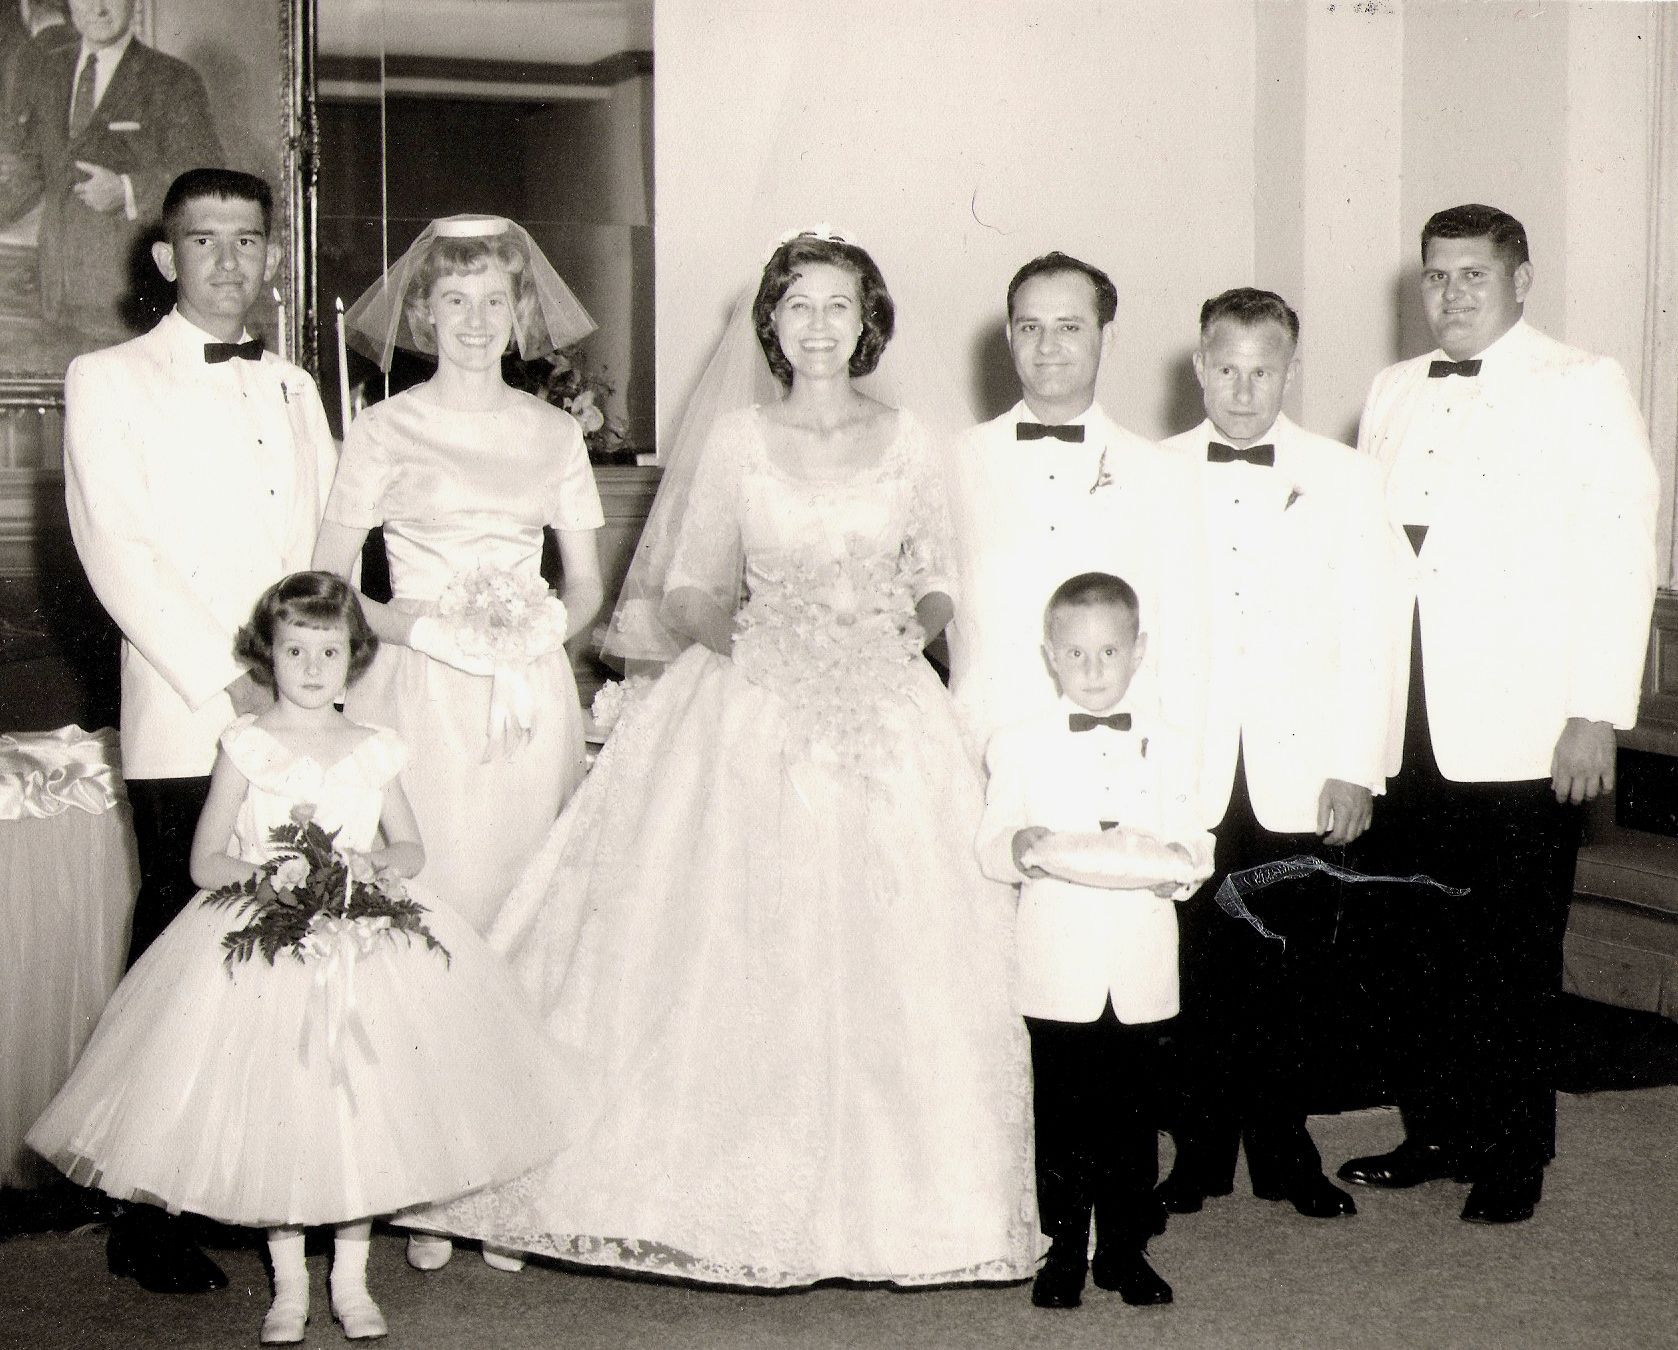 edfb9e93d90 ... flower girl dress. 1950s bride vintage wedding